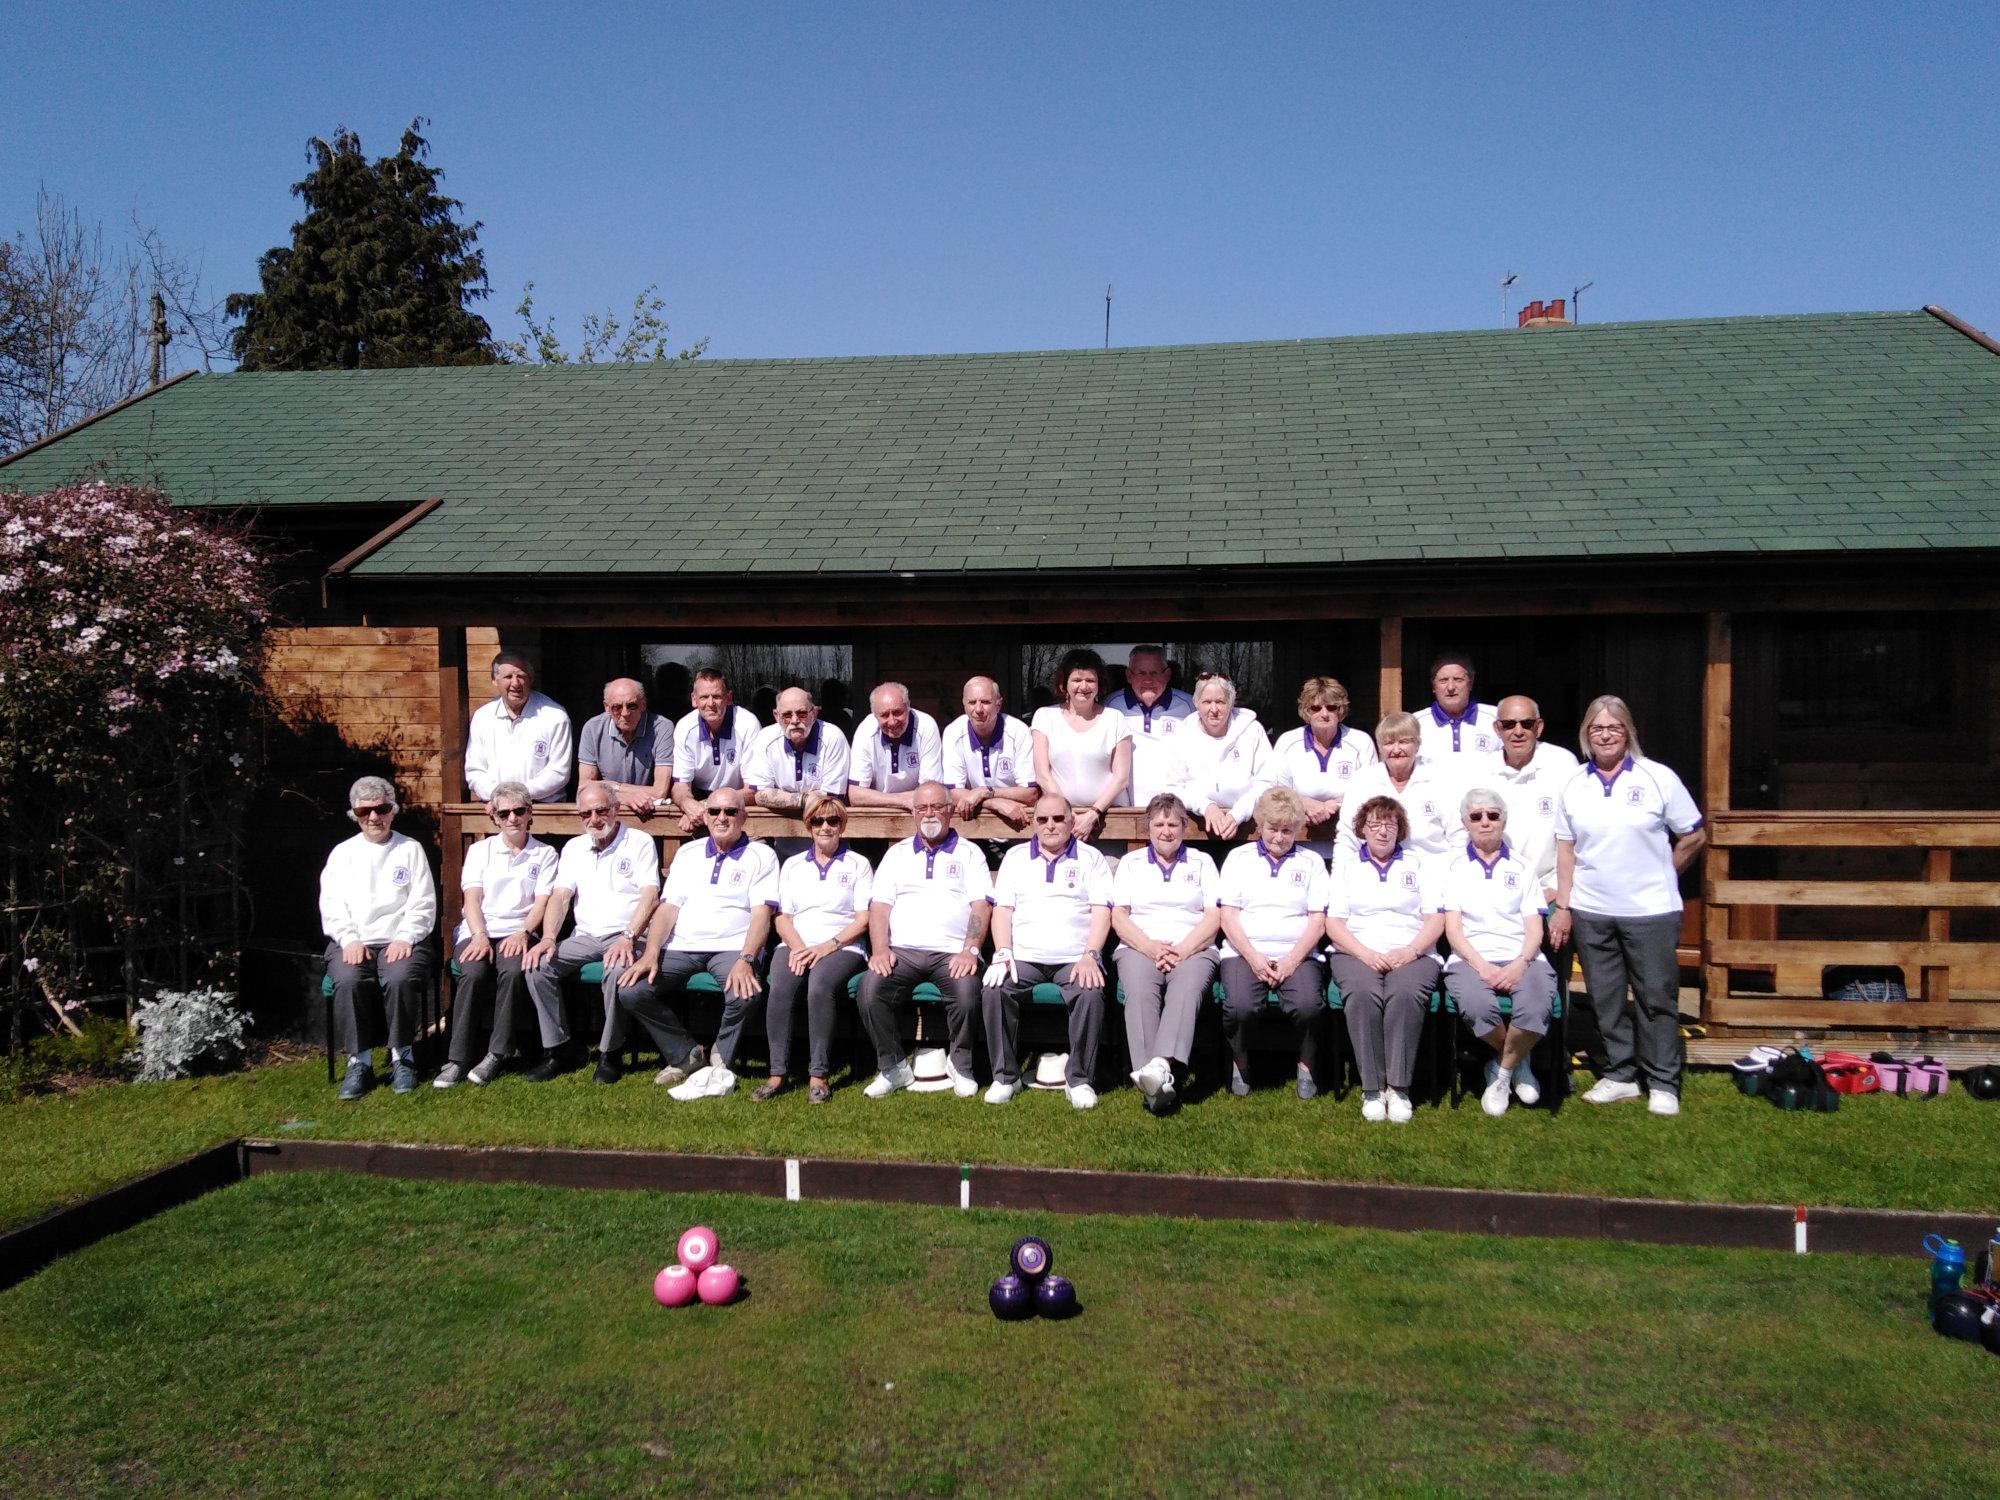 Beverley Bowling club members outside their Flemingate pavilion, showing new season's Teeshirts.